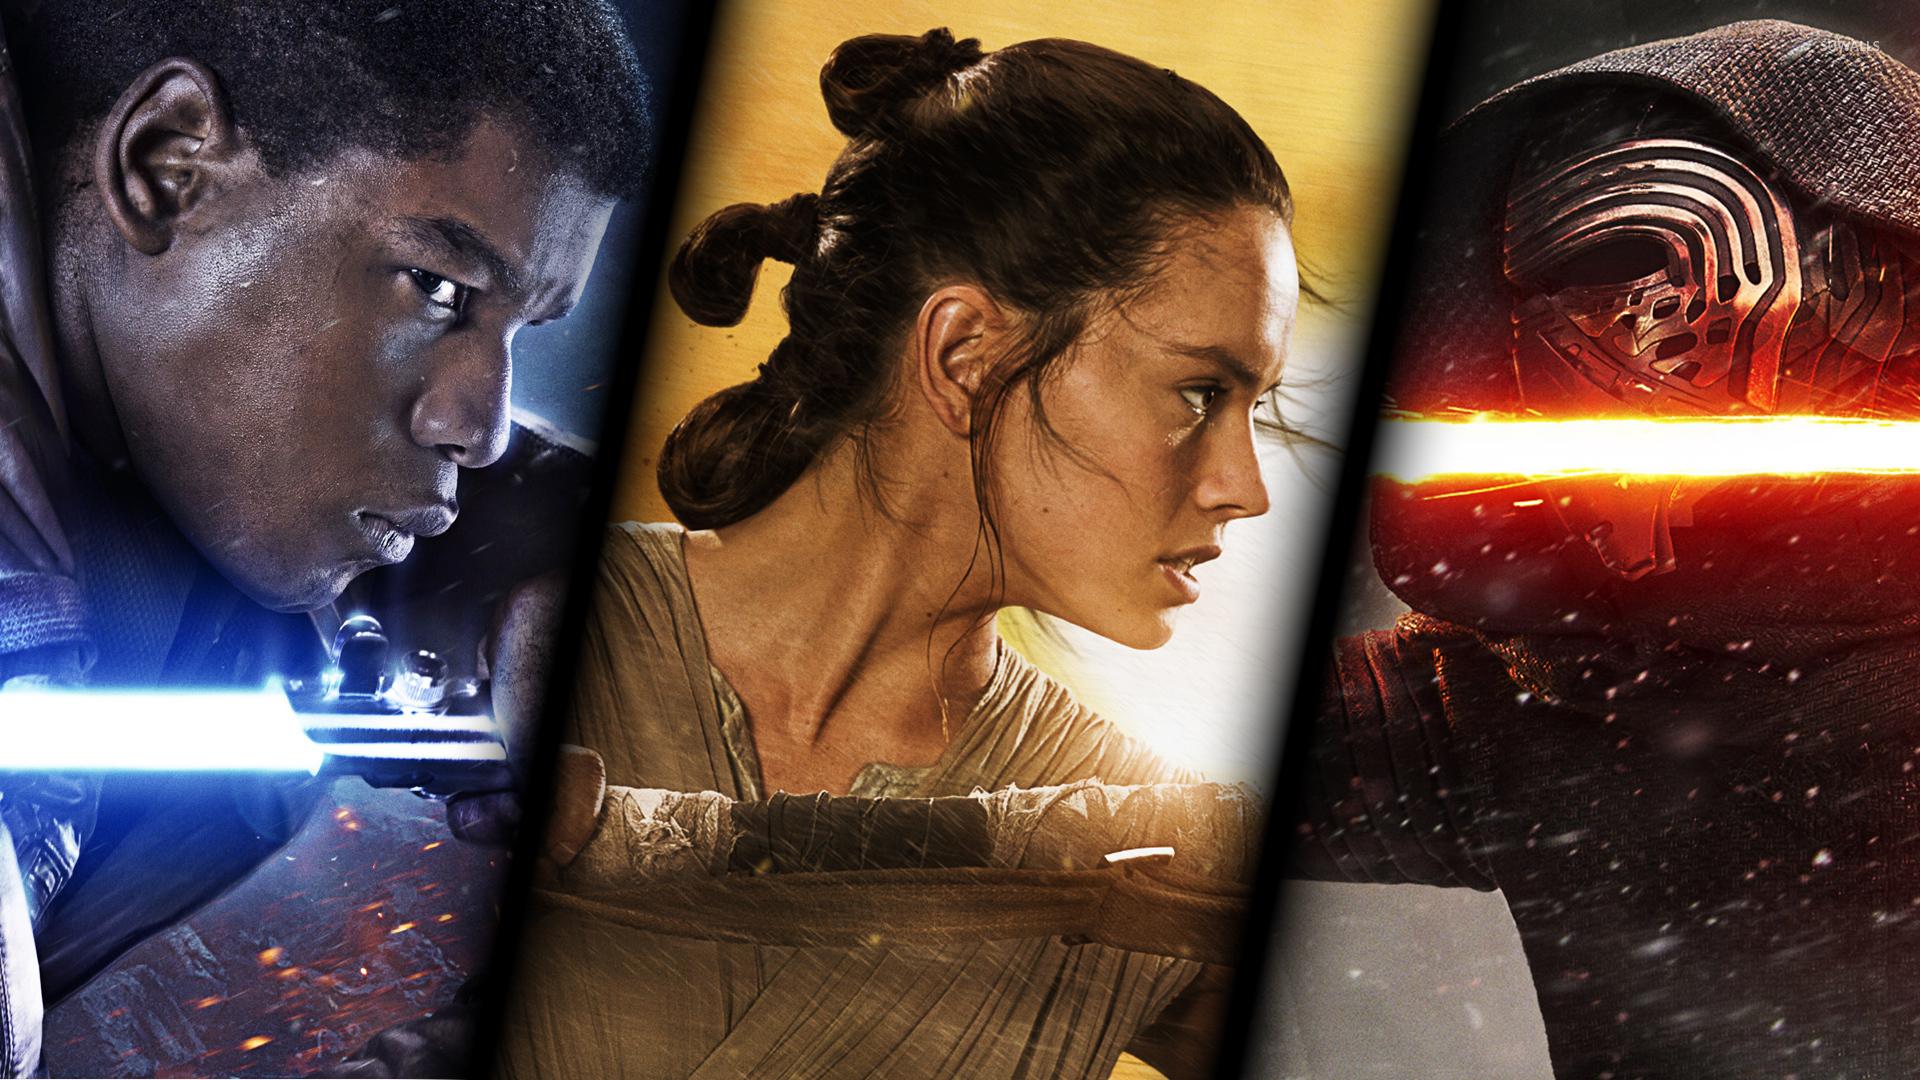 Finn Rey and Kylo Ren in Star Wars The Force Awakens wallpaper 1280x800